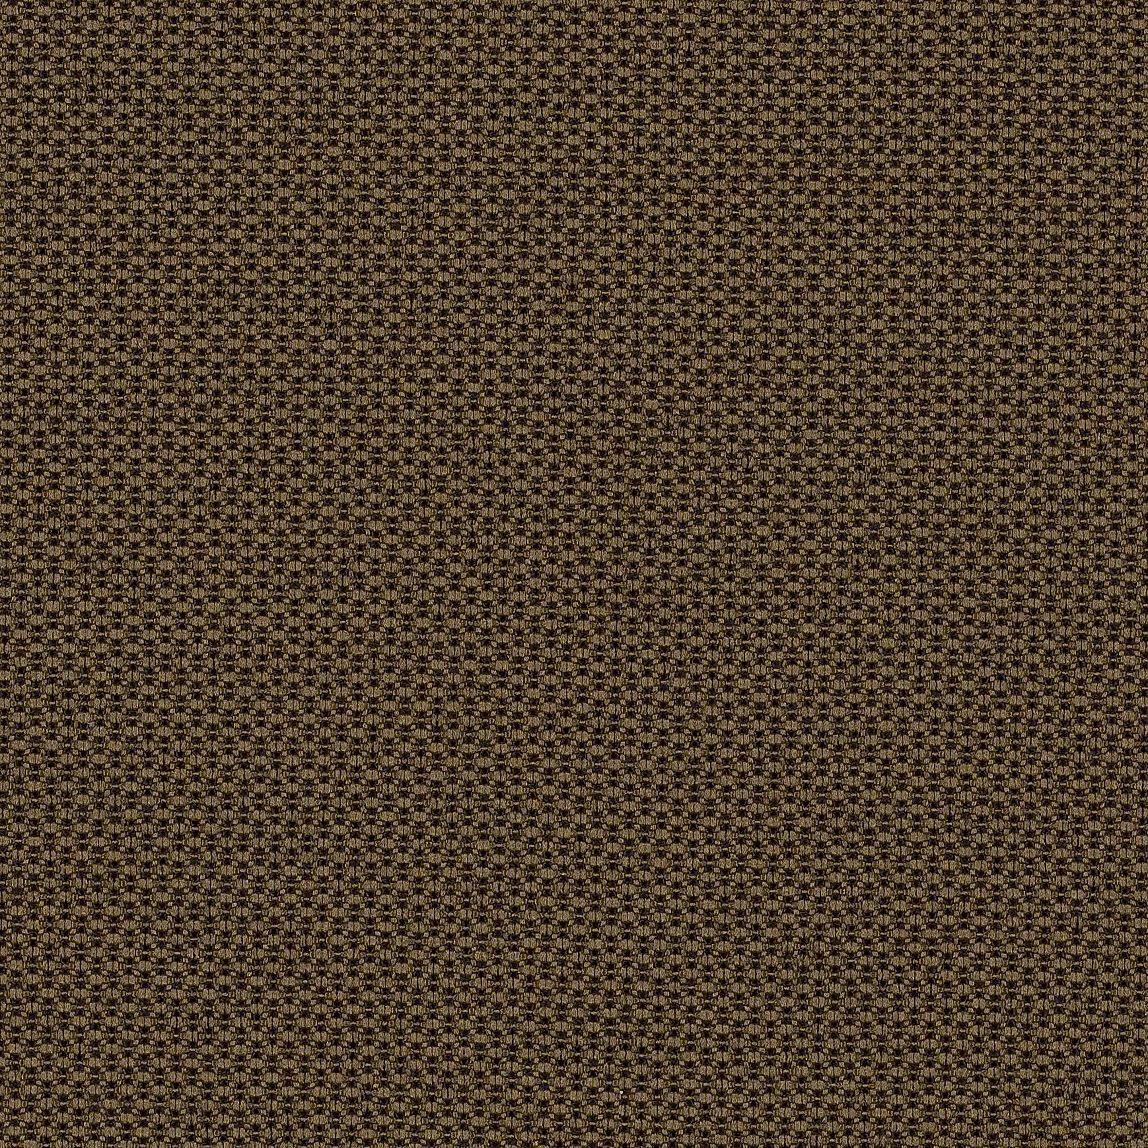 Bryant Park  Chocolate Swatch